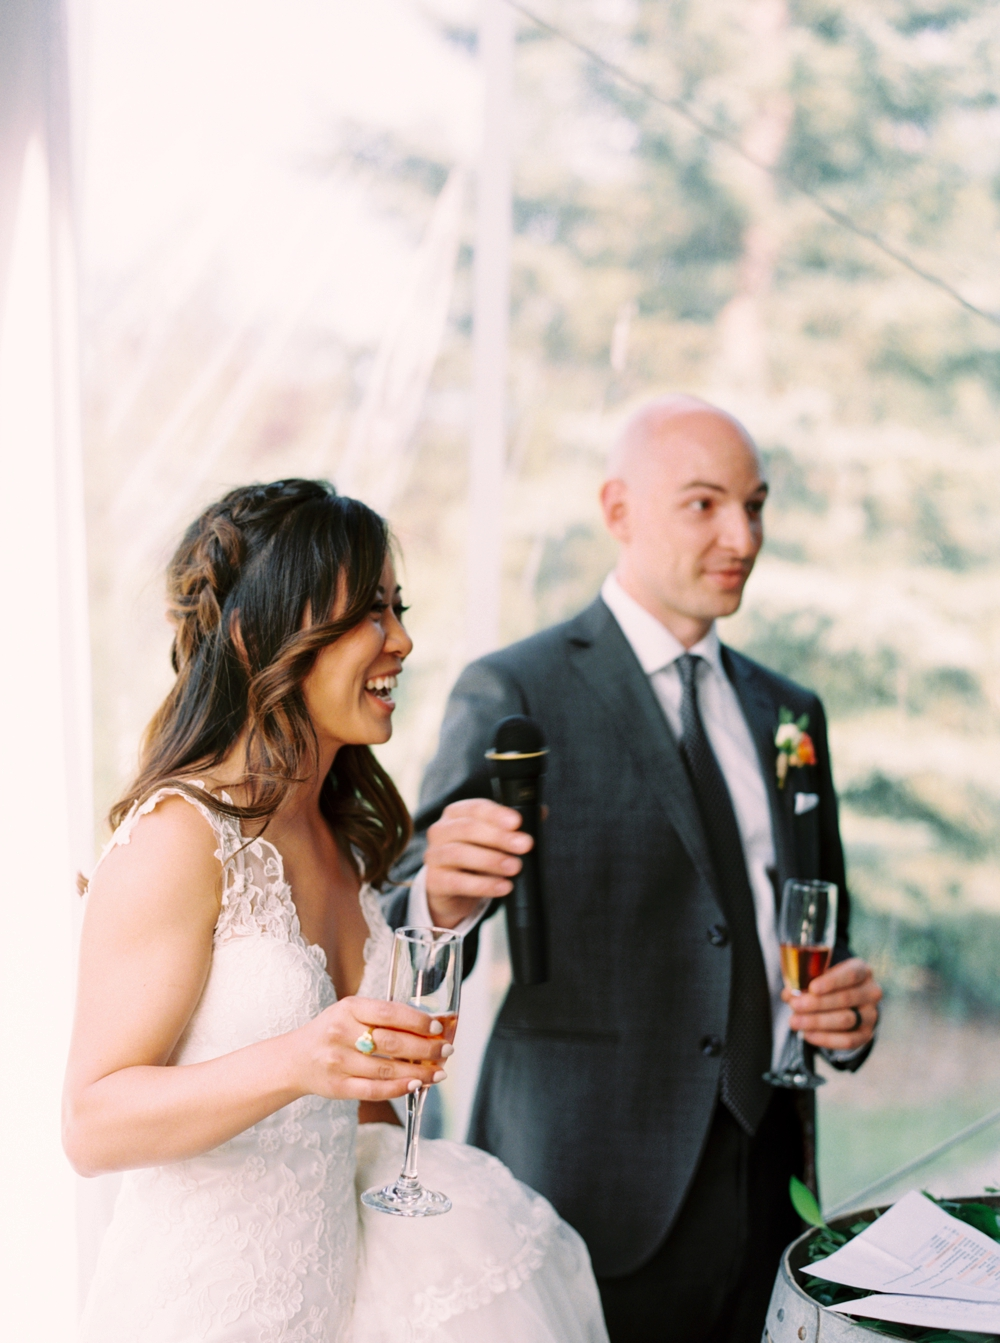 Calgary Wedding Photographer | Meadow Muse Pavilion Wedding | Canmore Photographers | Fish Creek Park Tent Wedding | Bride and groom